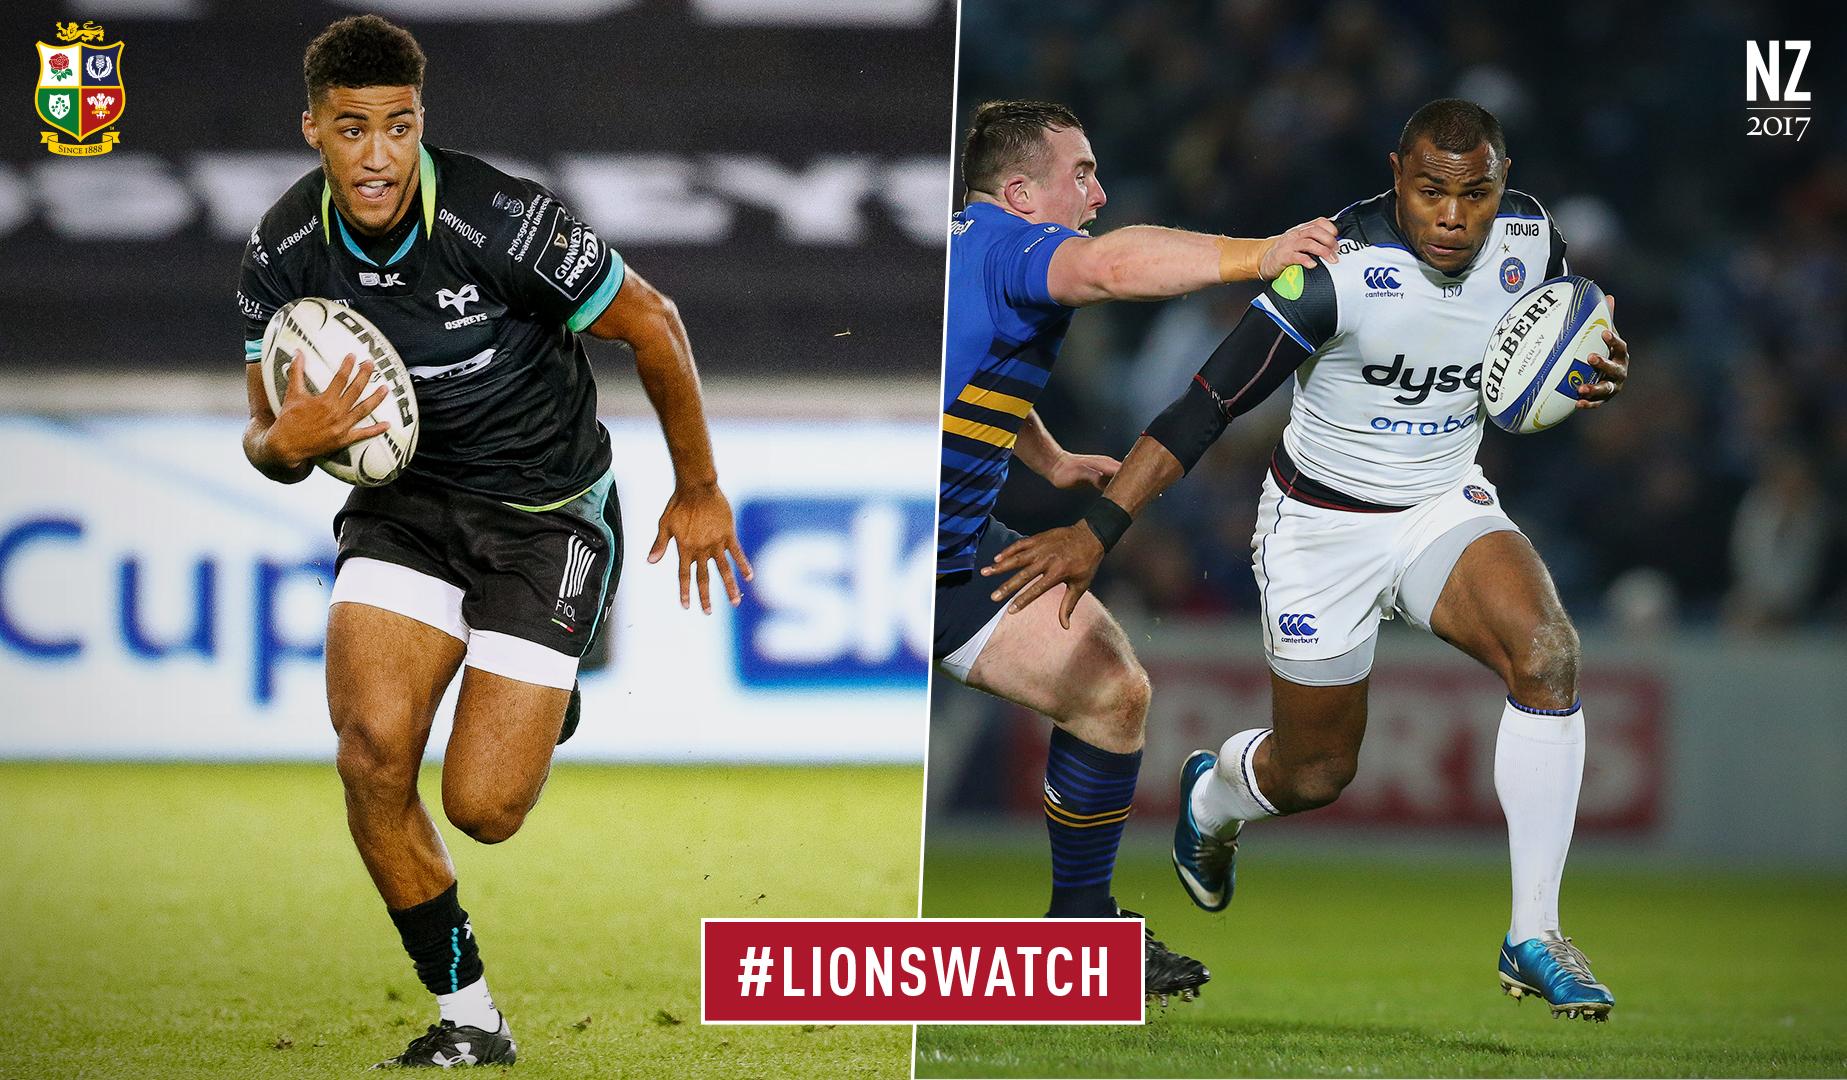 LionsWatch: The wide men making ground after Round Seven